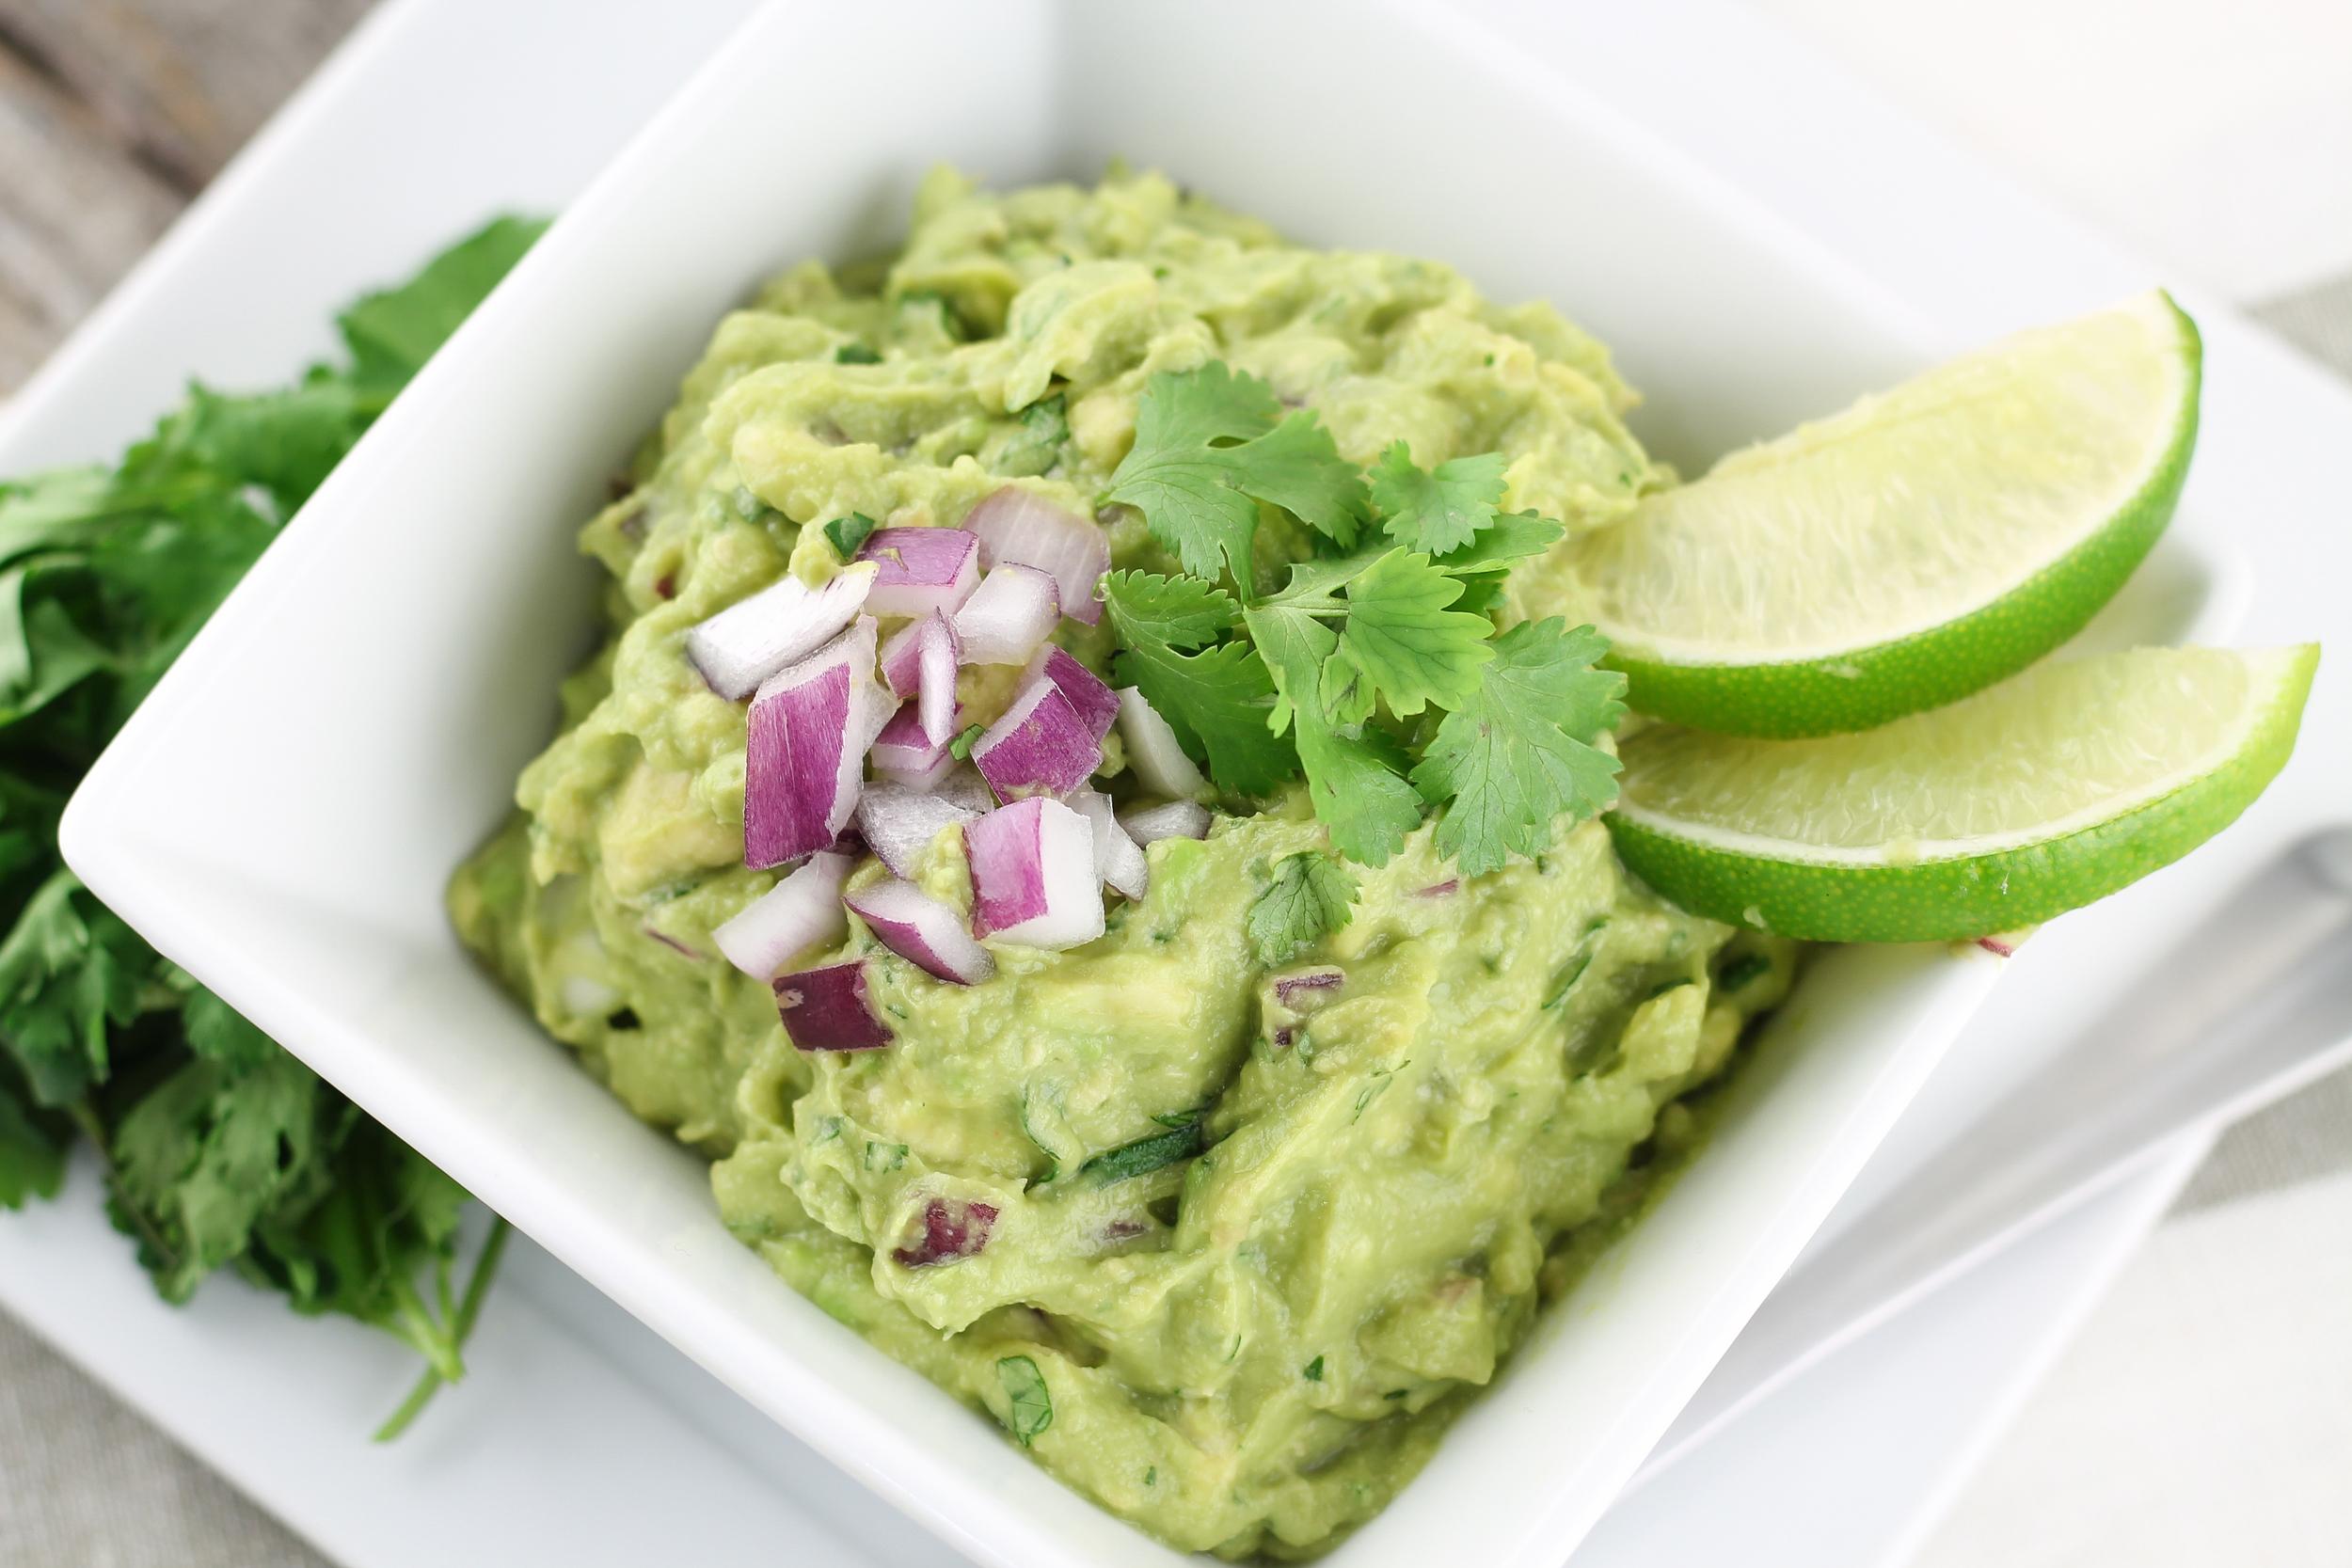 Paleo Guacamole, Homemade, Easy, Quick, No Mess, Healthy Guacamole